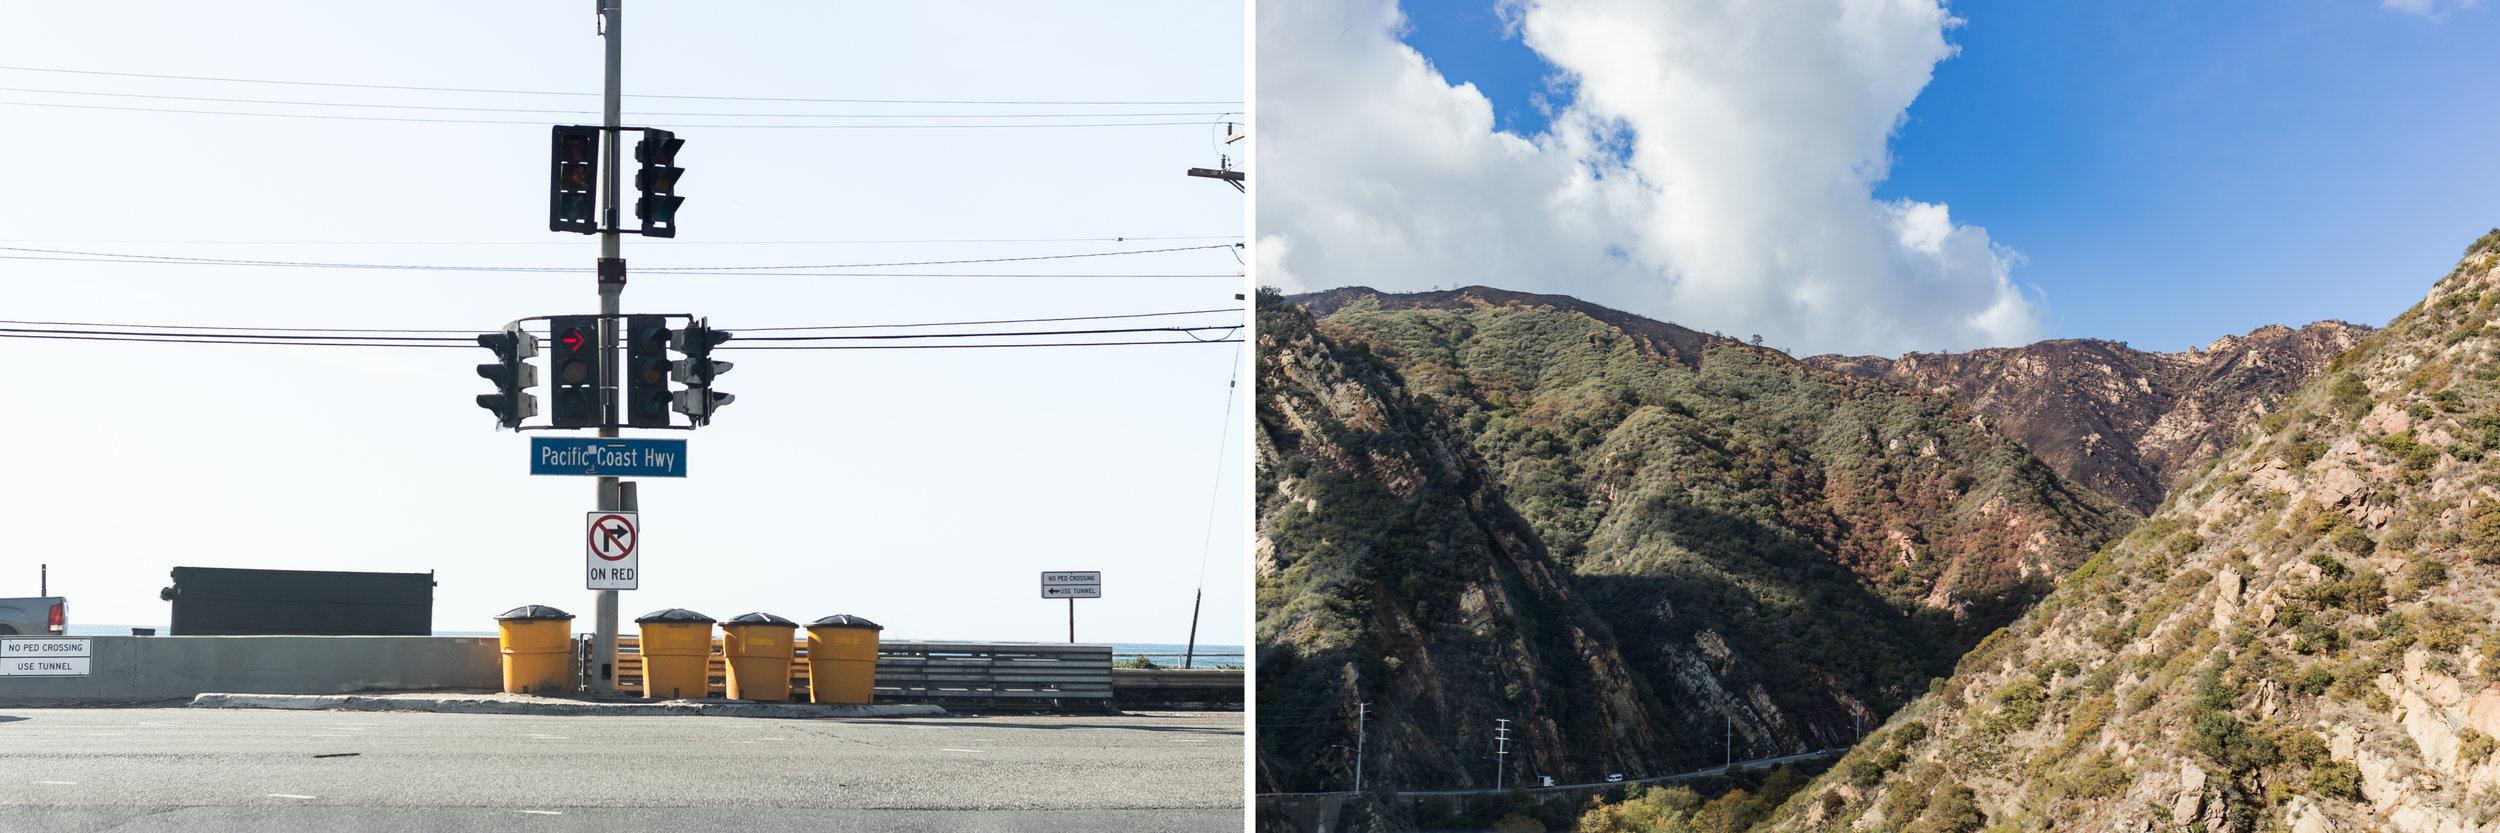 Highway One California.jpg